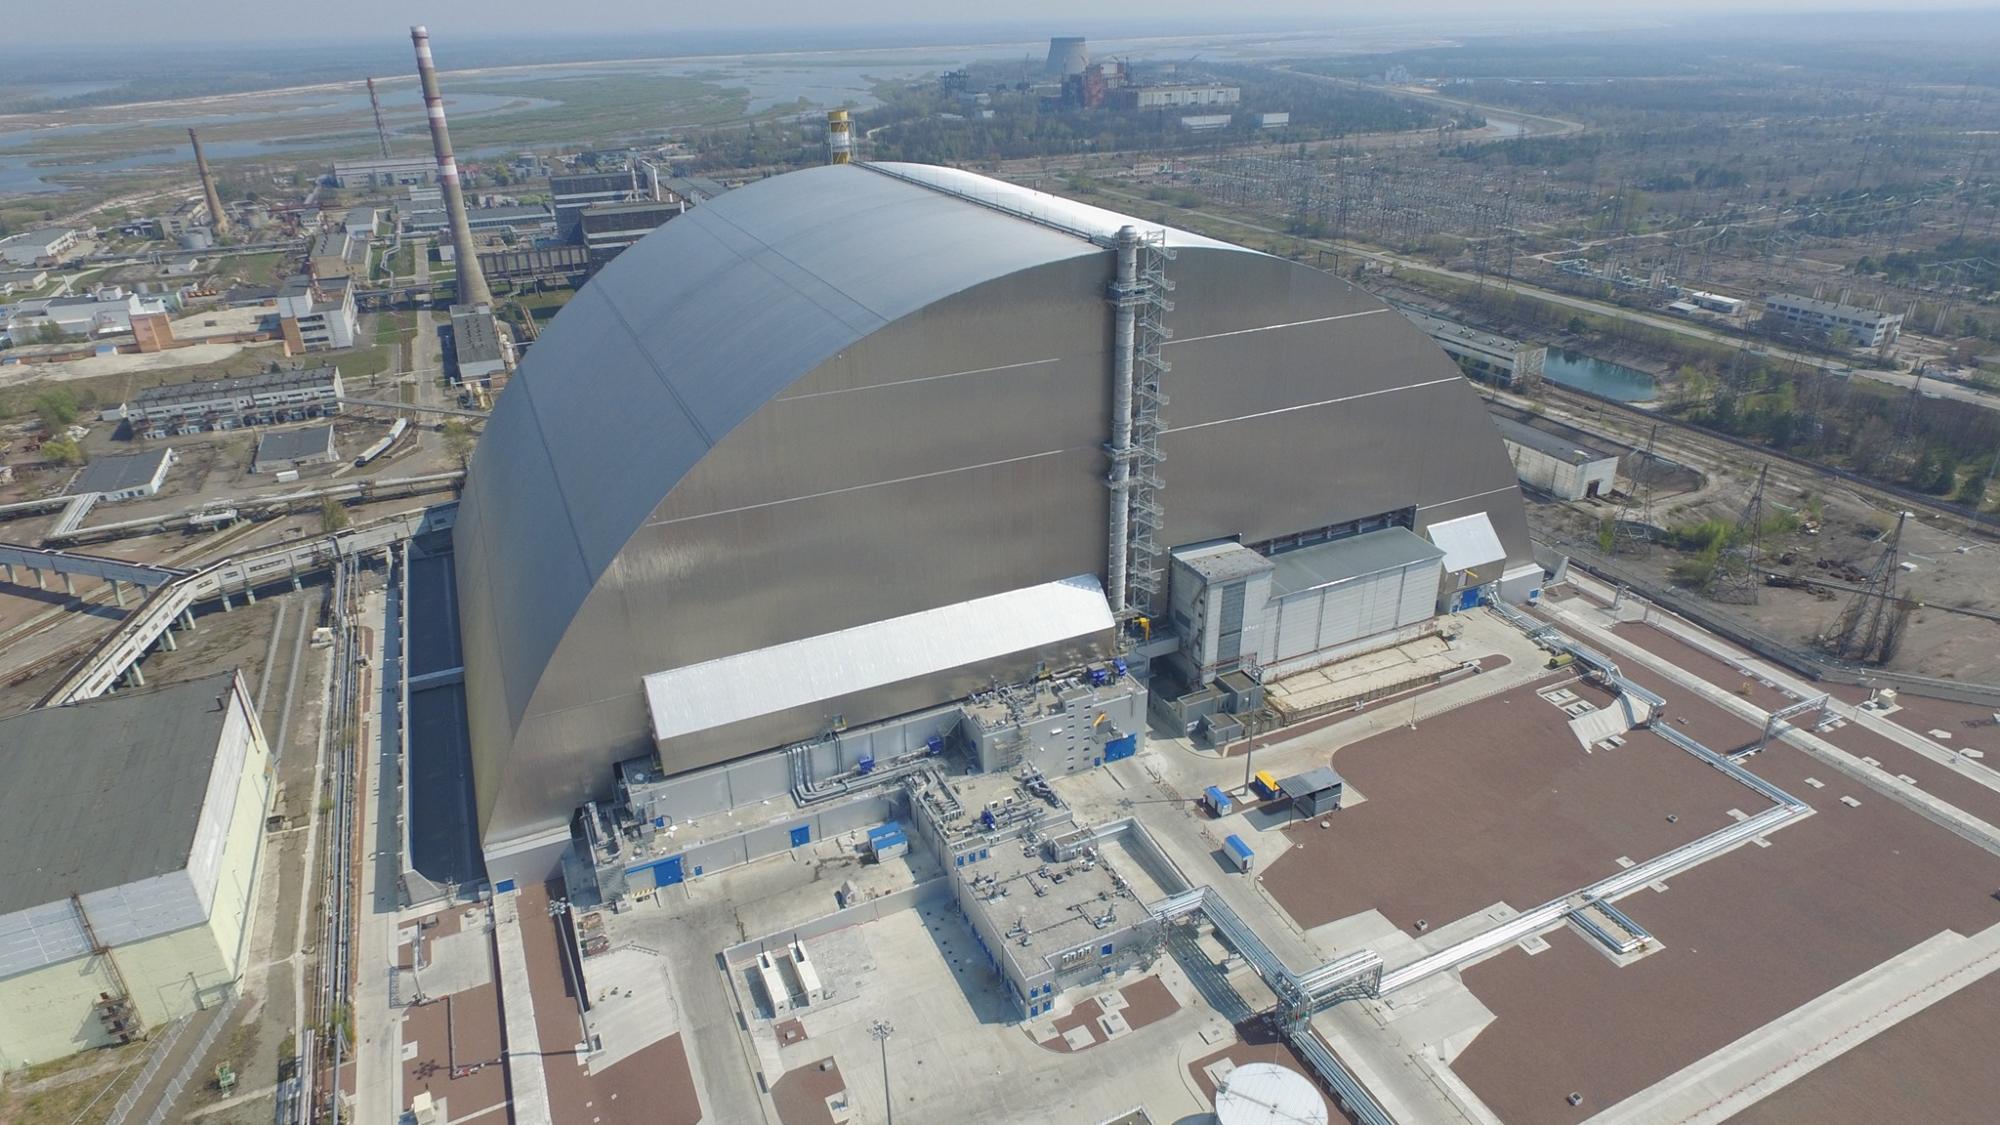 Нова арка над четвертим реактором